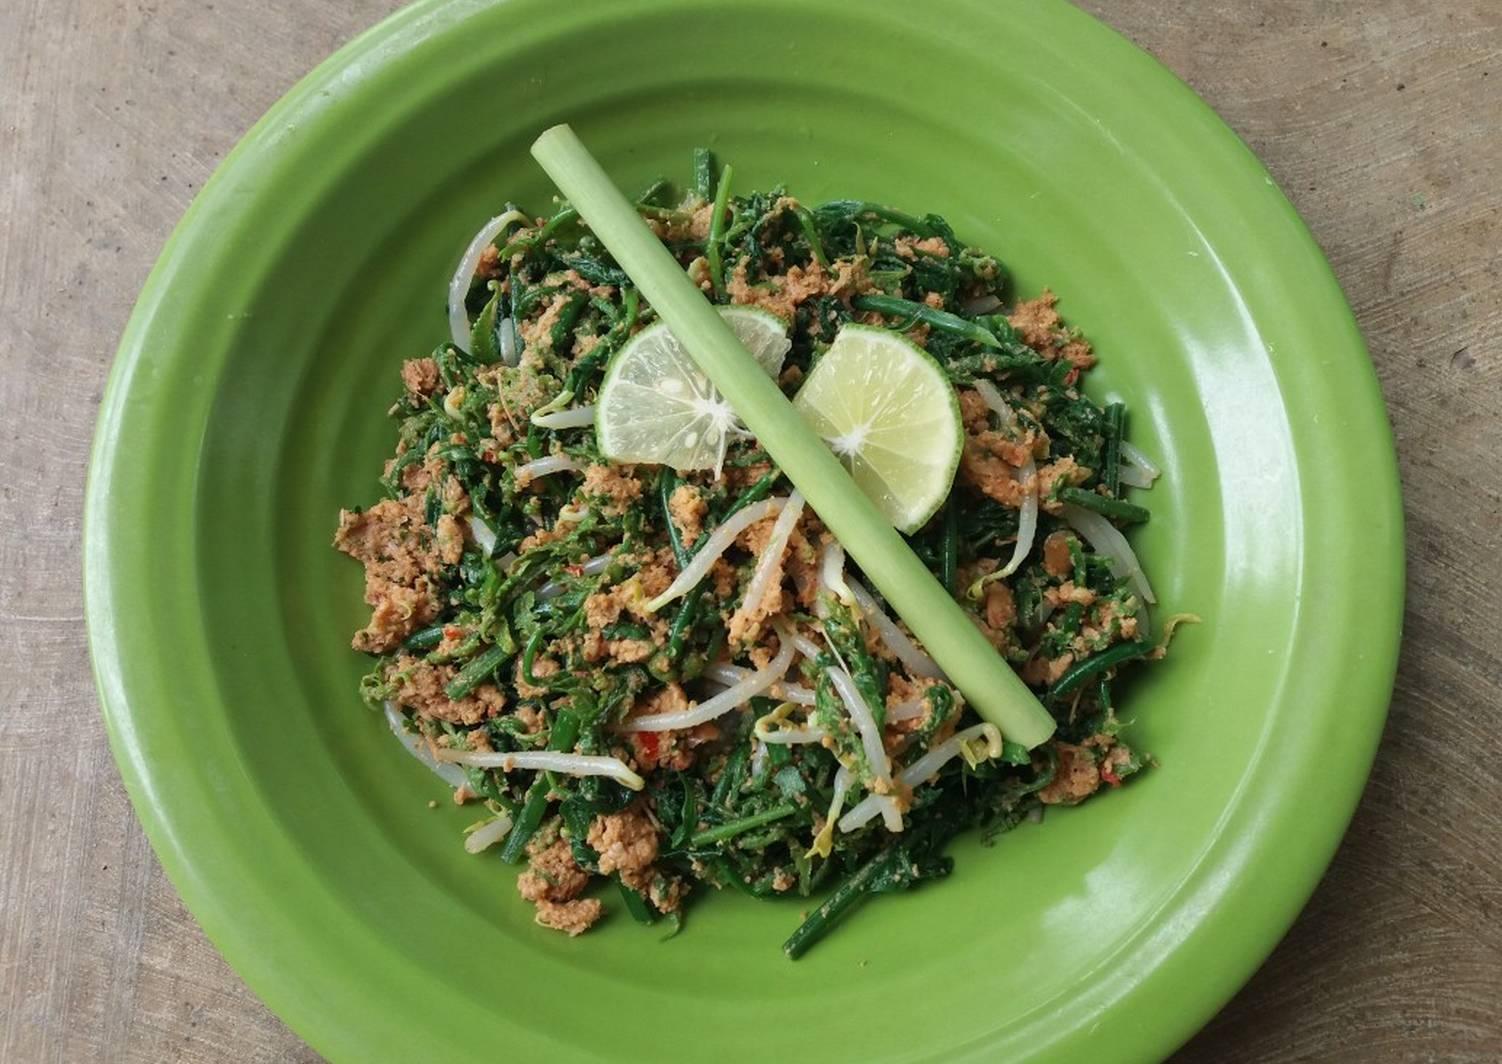 Anyang Deli Salad Ala Masyarakat Melayu